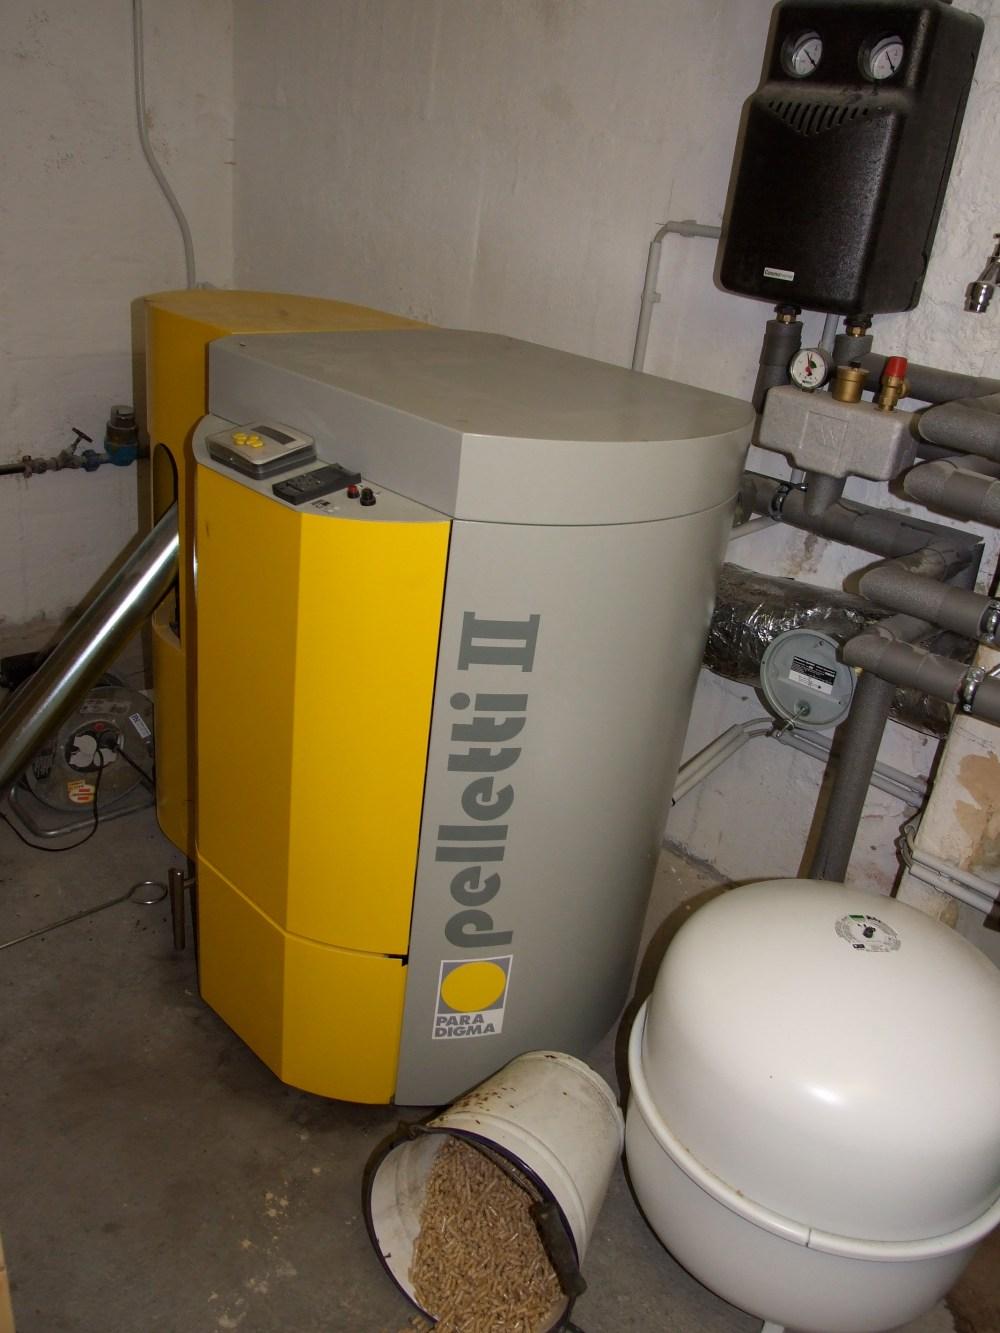 medium resolution of combi boiler with underfloor heating and radiator